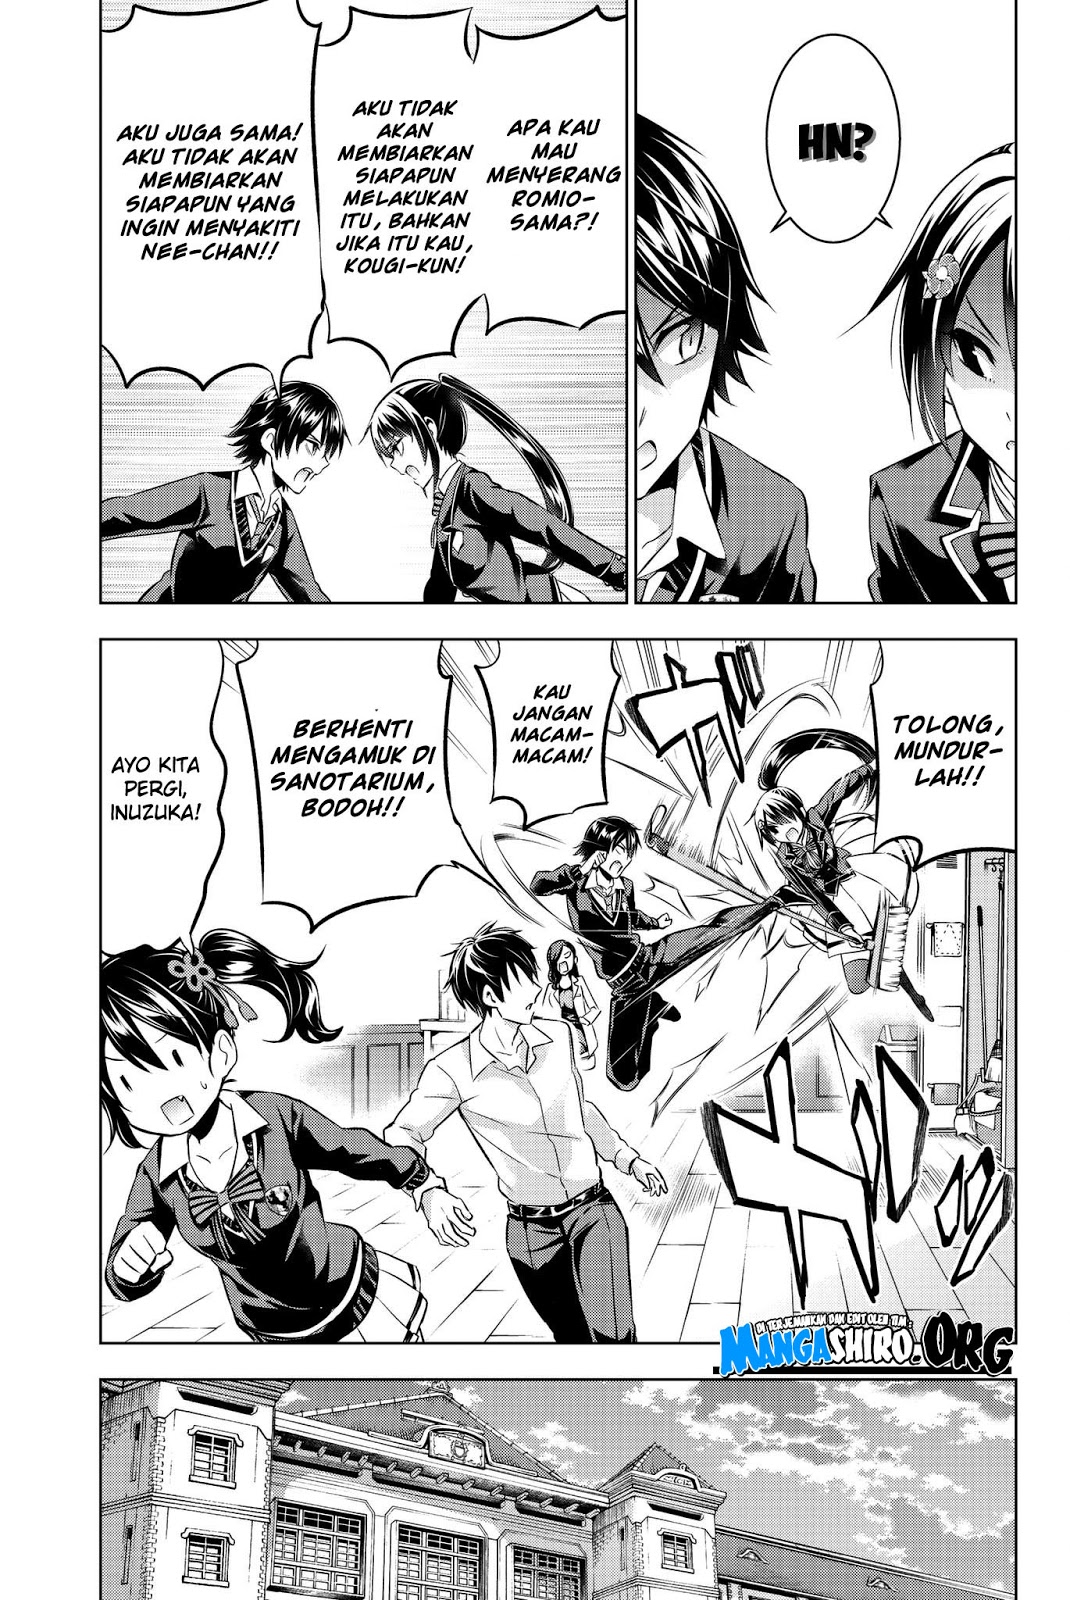 Kishuku Gakkou no Juliet: Chapter 75 - Page 10